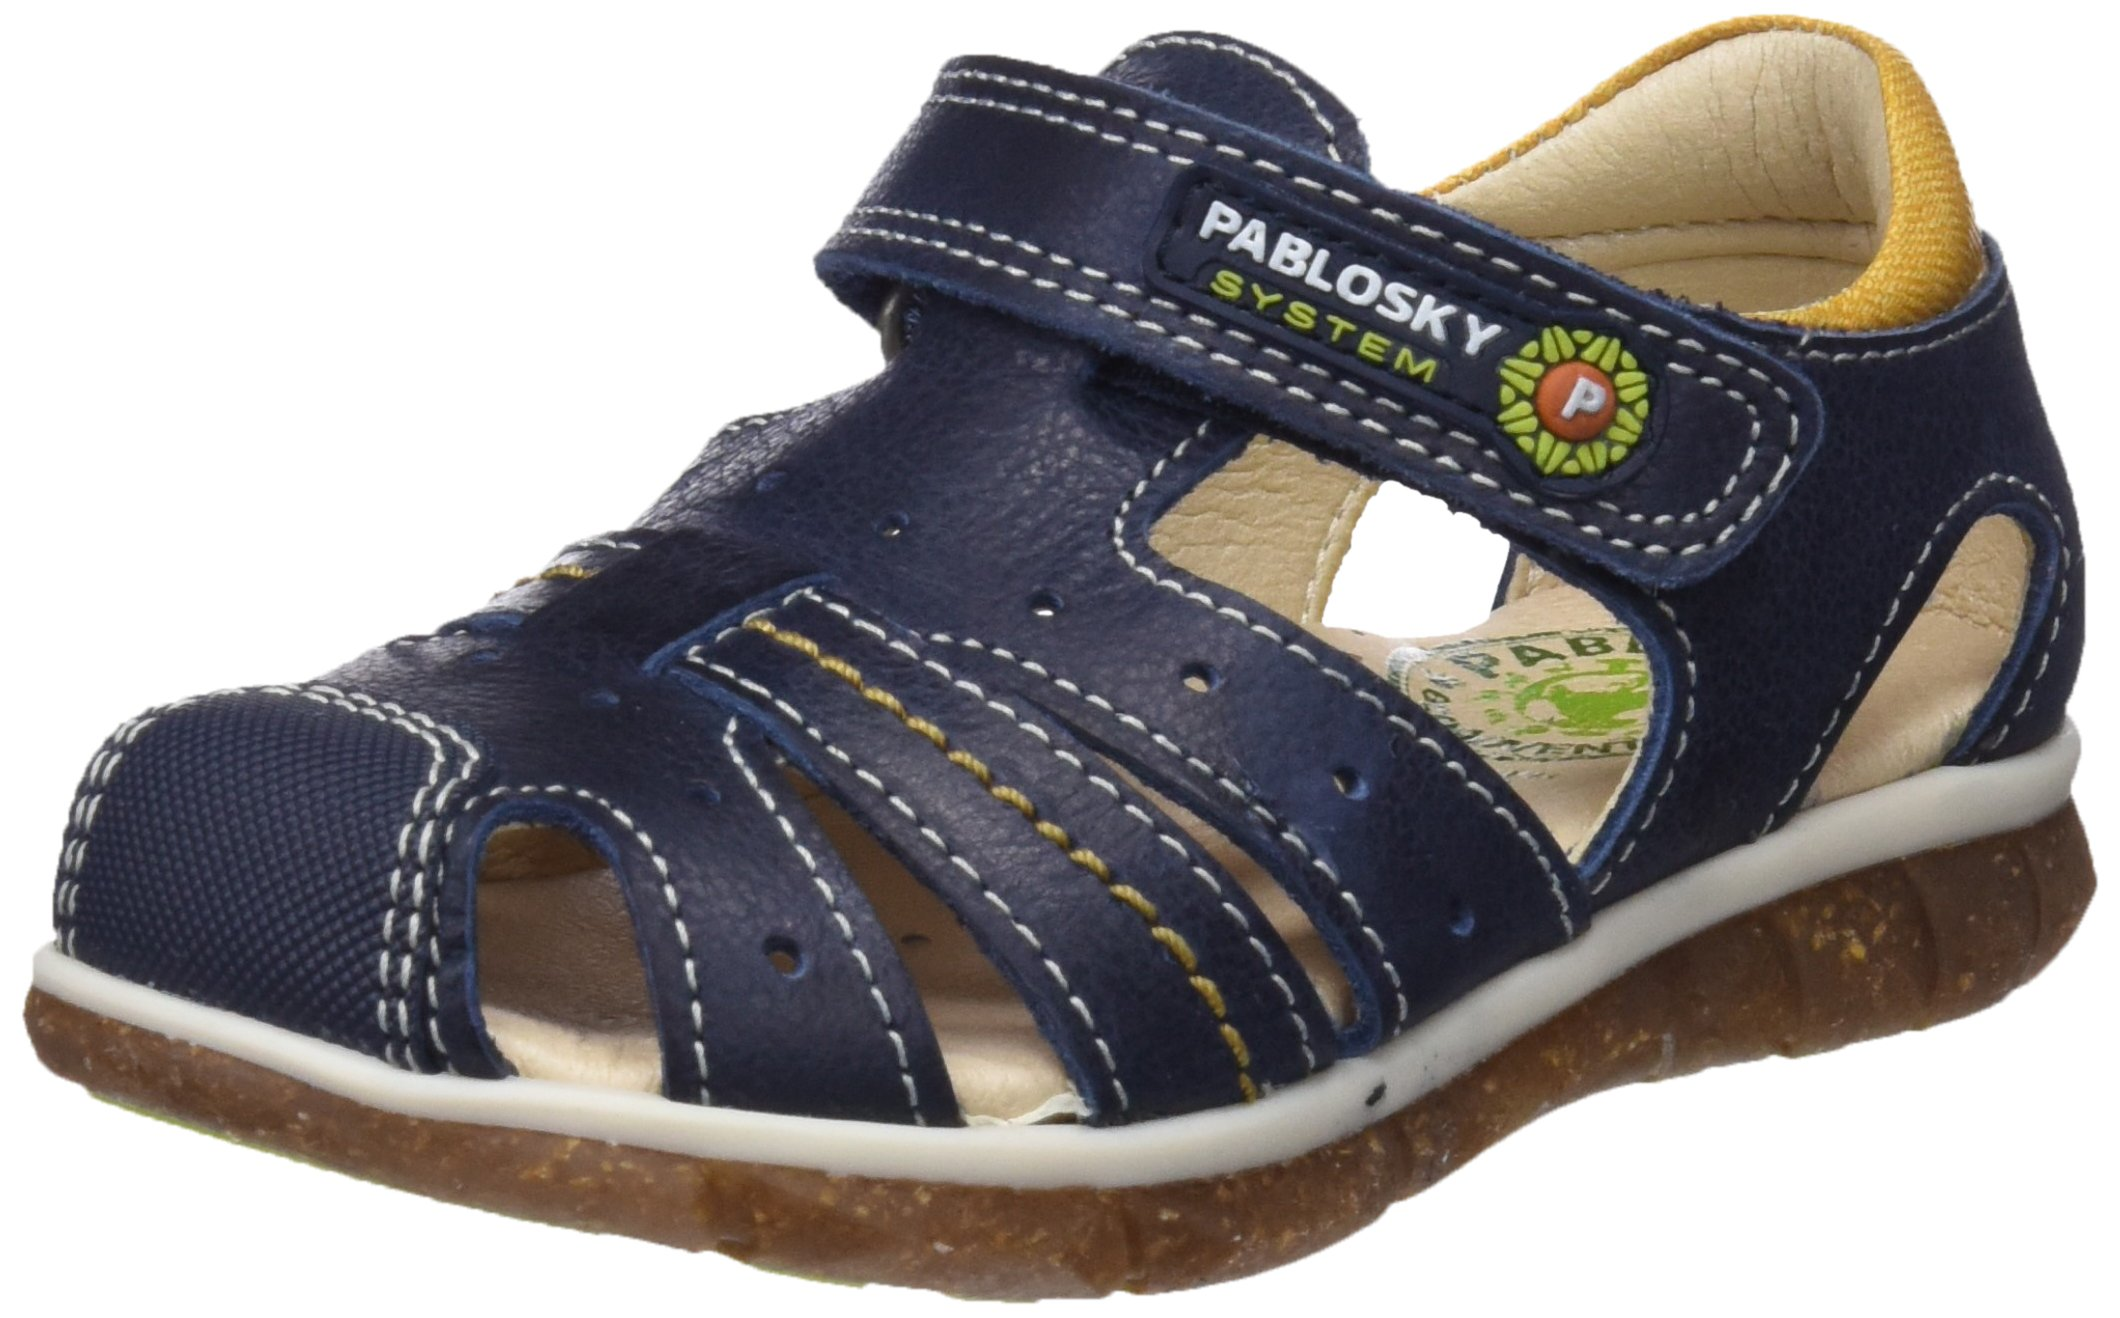 Pablosky Boys' 583226 Closed Toe Sandals, Blue (Azul 583226), 9 UK